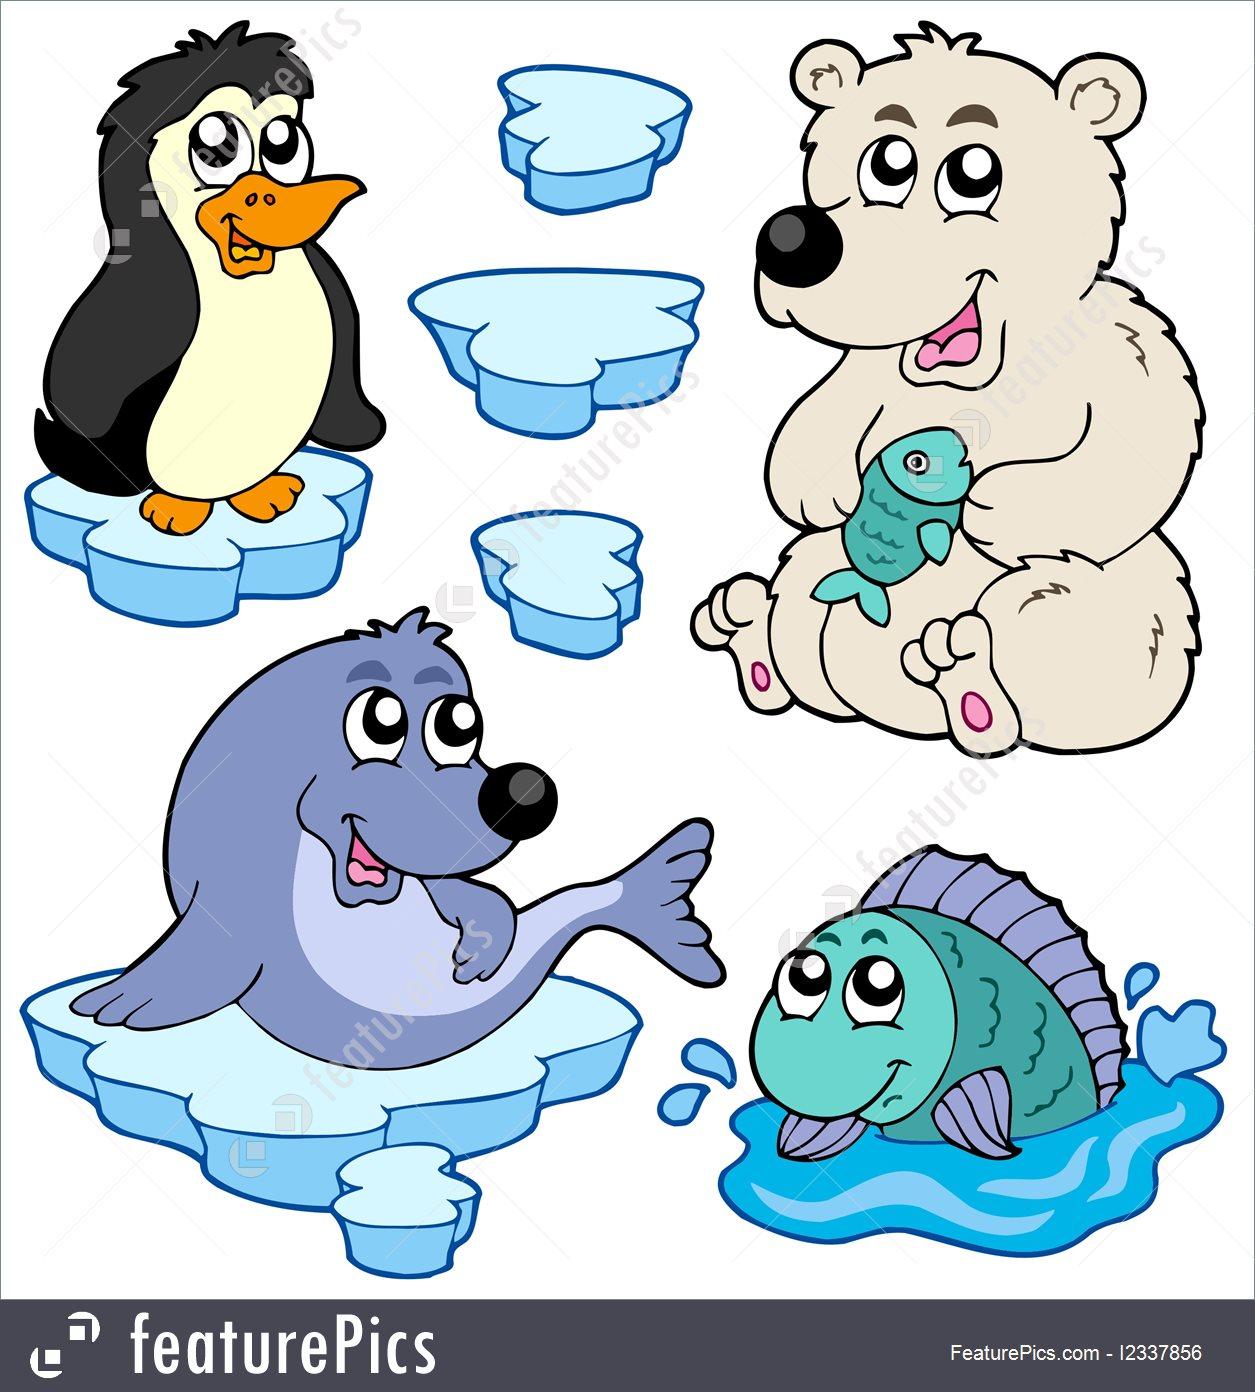 Antarctic animals clipart 4 » Clipart Station.